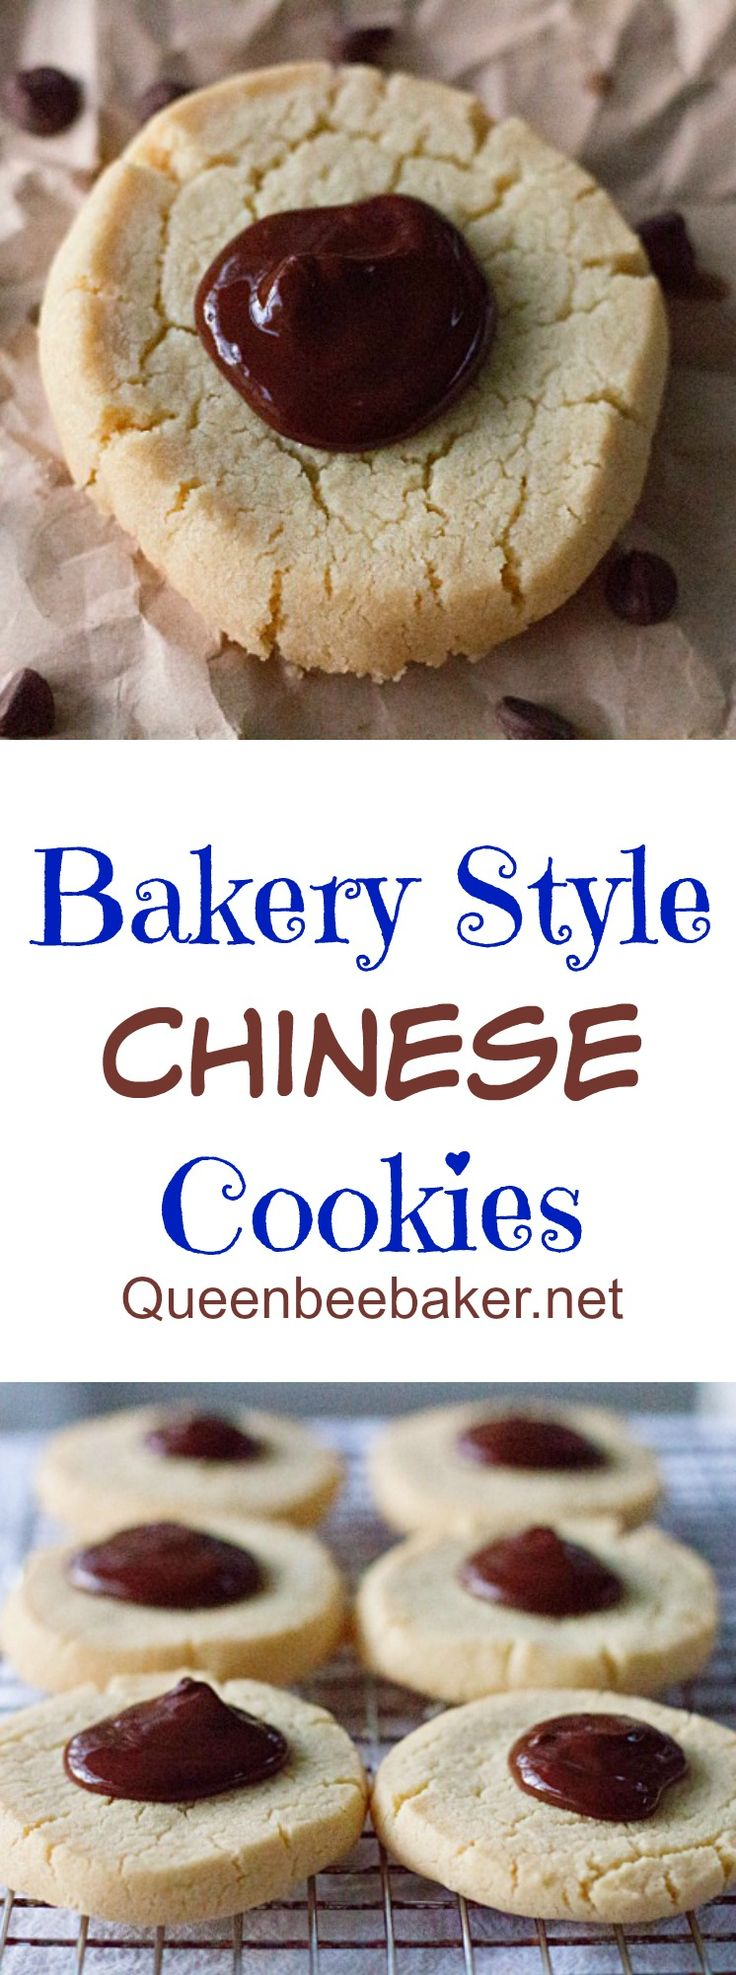 Bakery Style Chinese Cookies | Queenbeebaker.net #chinesecookies #cookies #bakerystylecookies #bakerystylechinesecookies